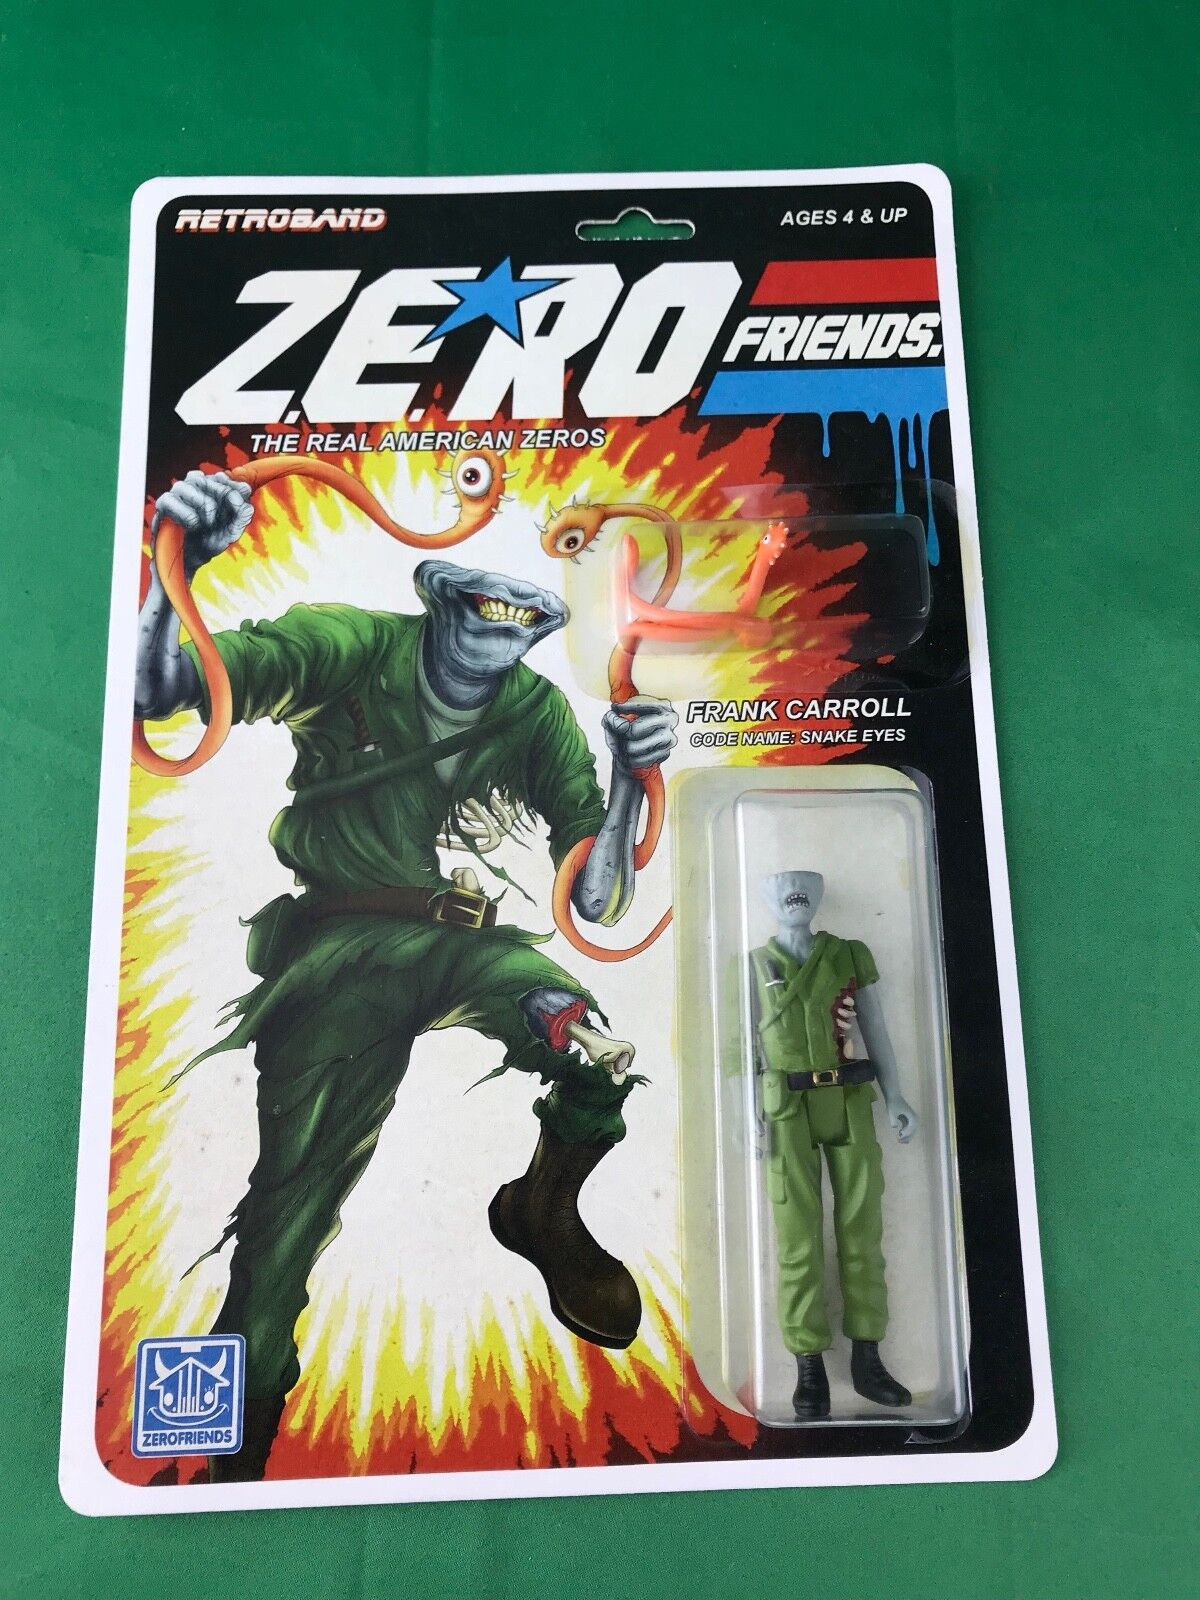 Retroband Zero Friends - Frank Carroll - Snake Eyes